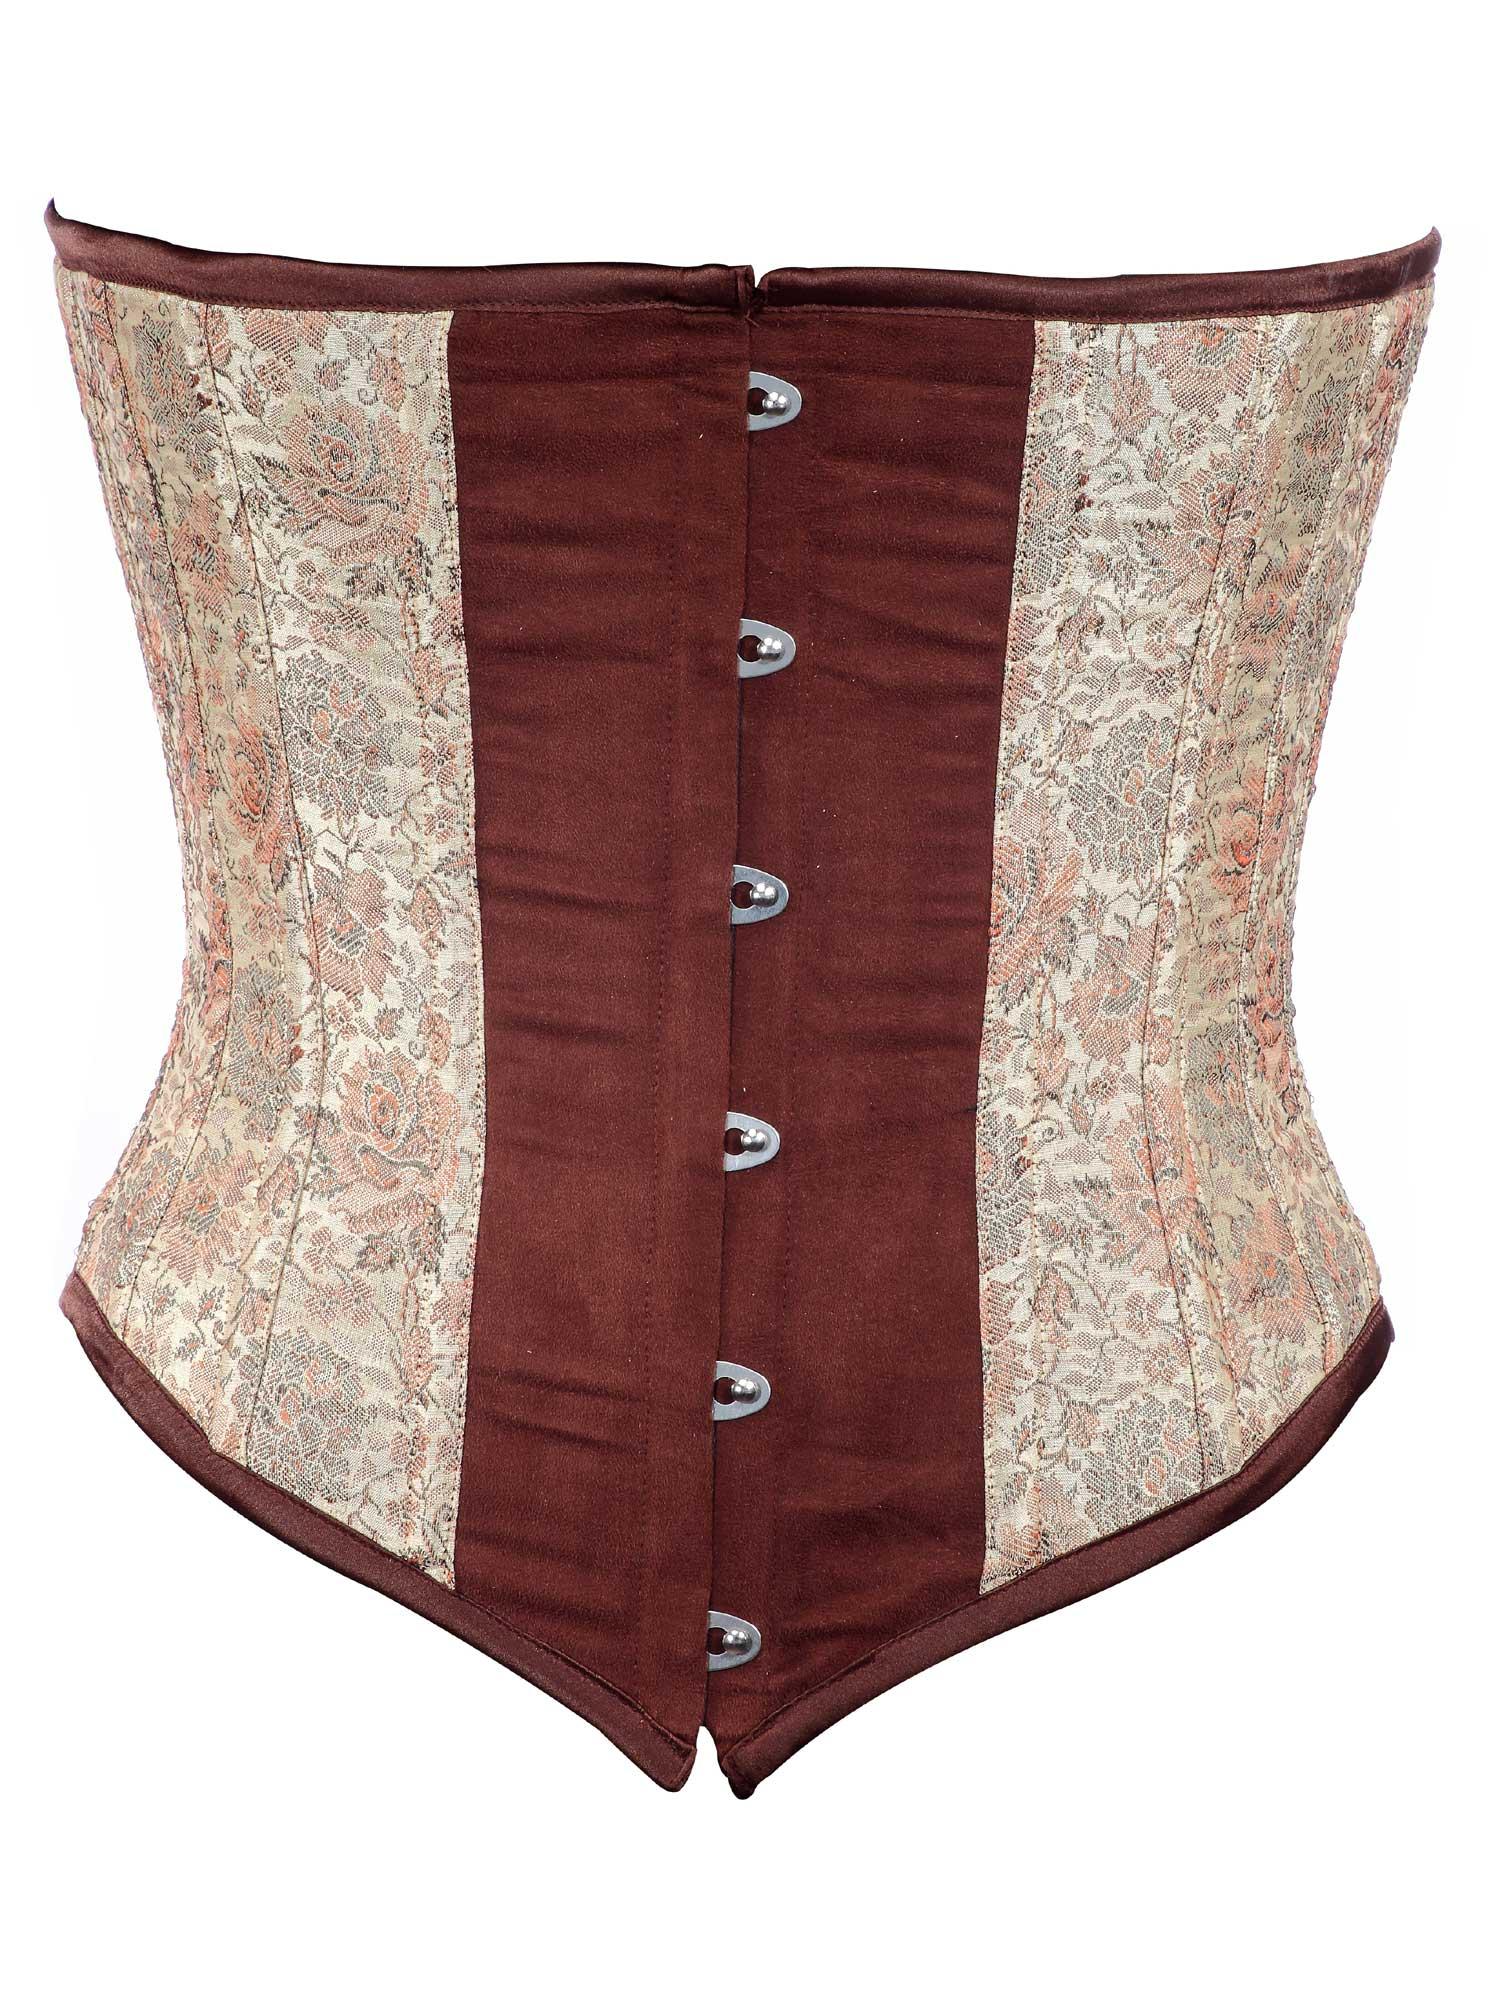 chocolate_suede_cream_brocade_fabric_steel_boning_underbust_corset_waist_cincher_bustier_bustiers_and_corsets_5.jpg